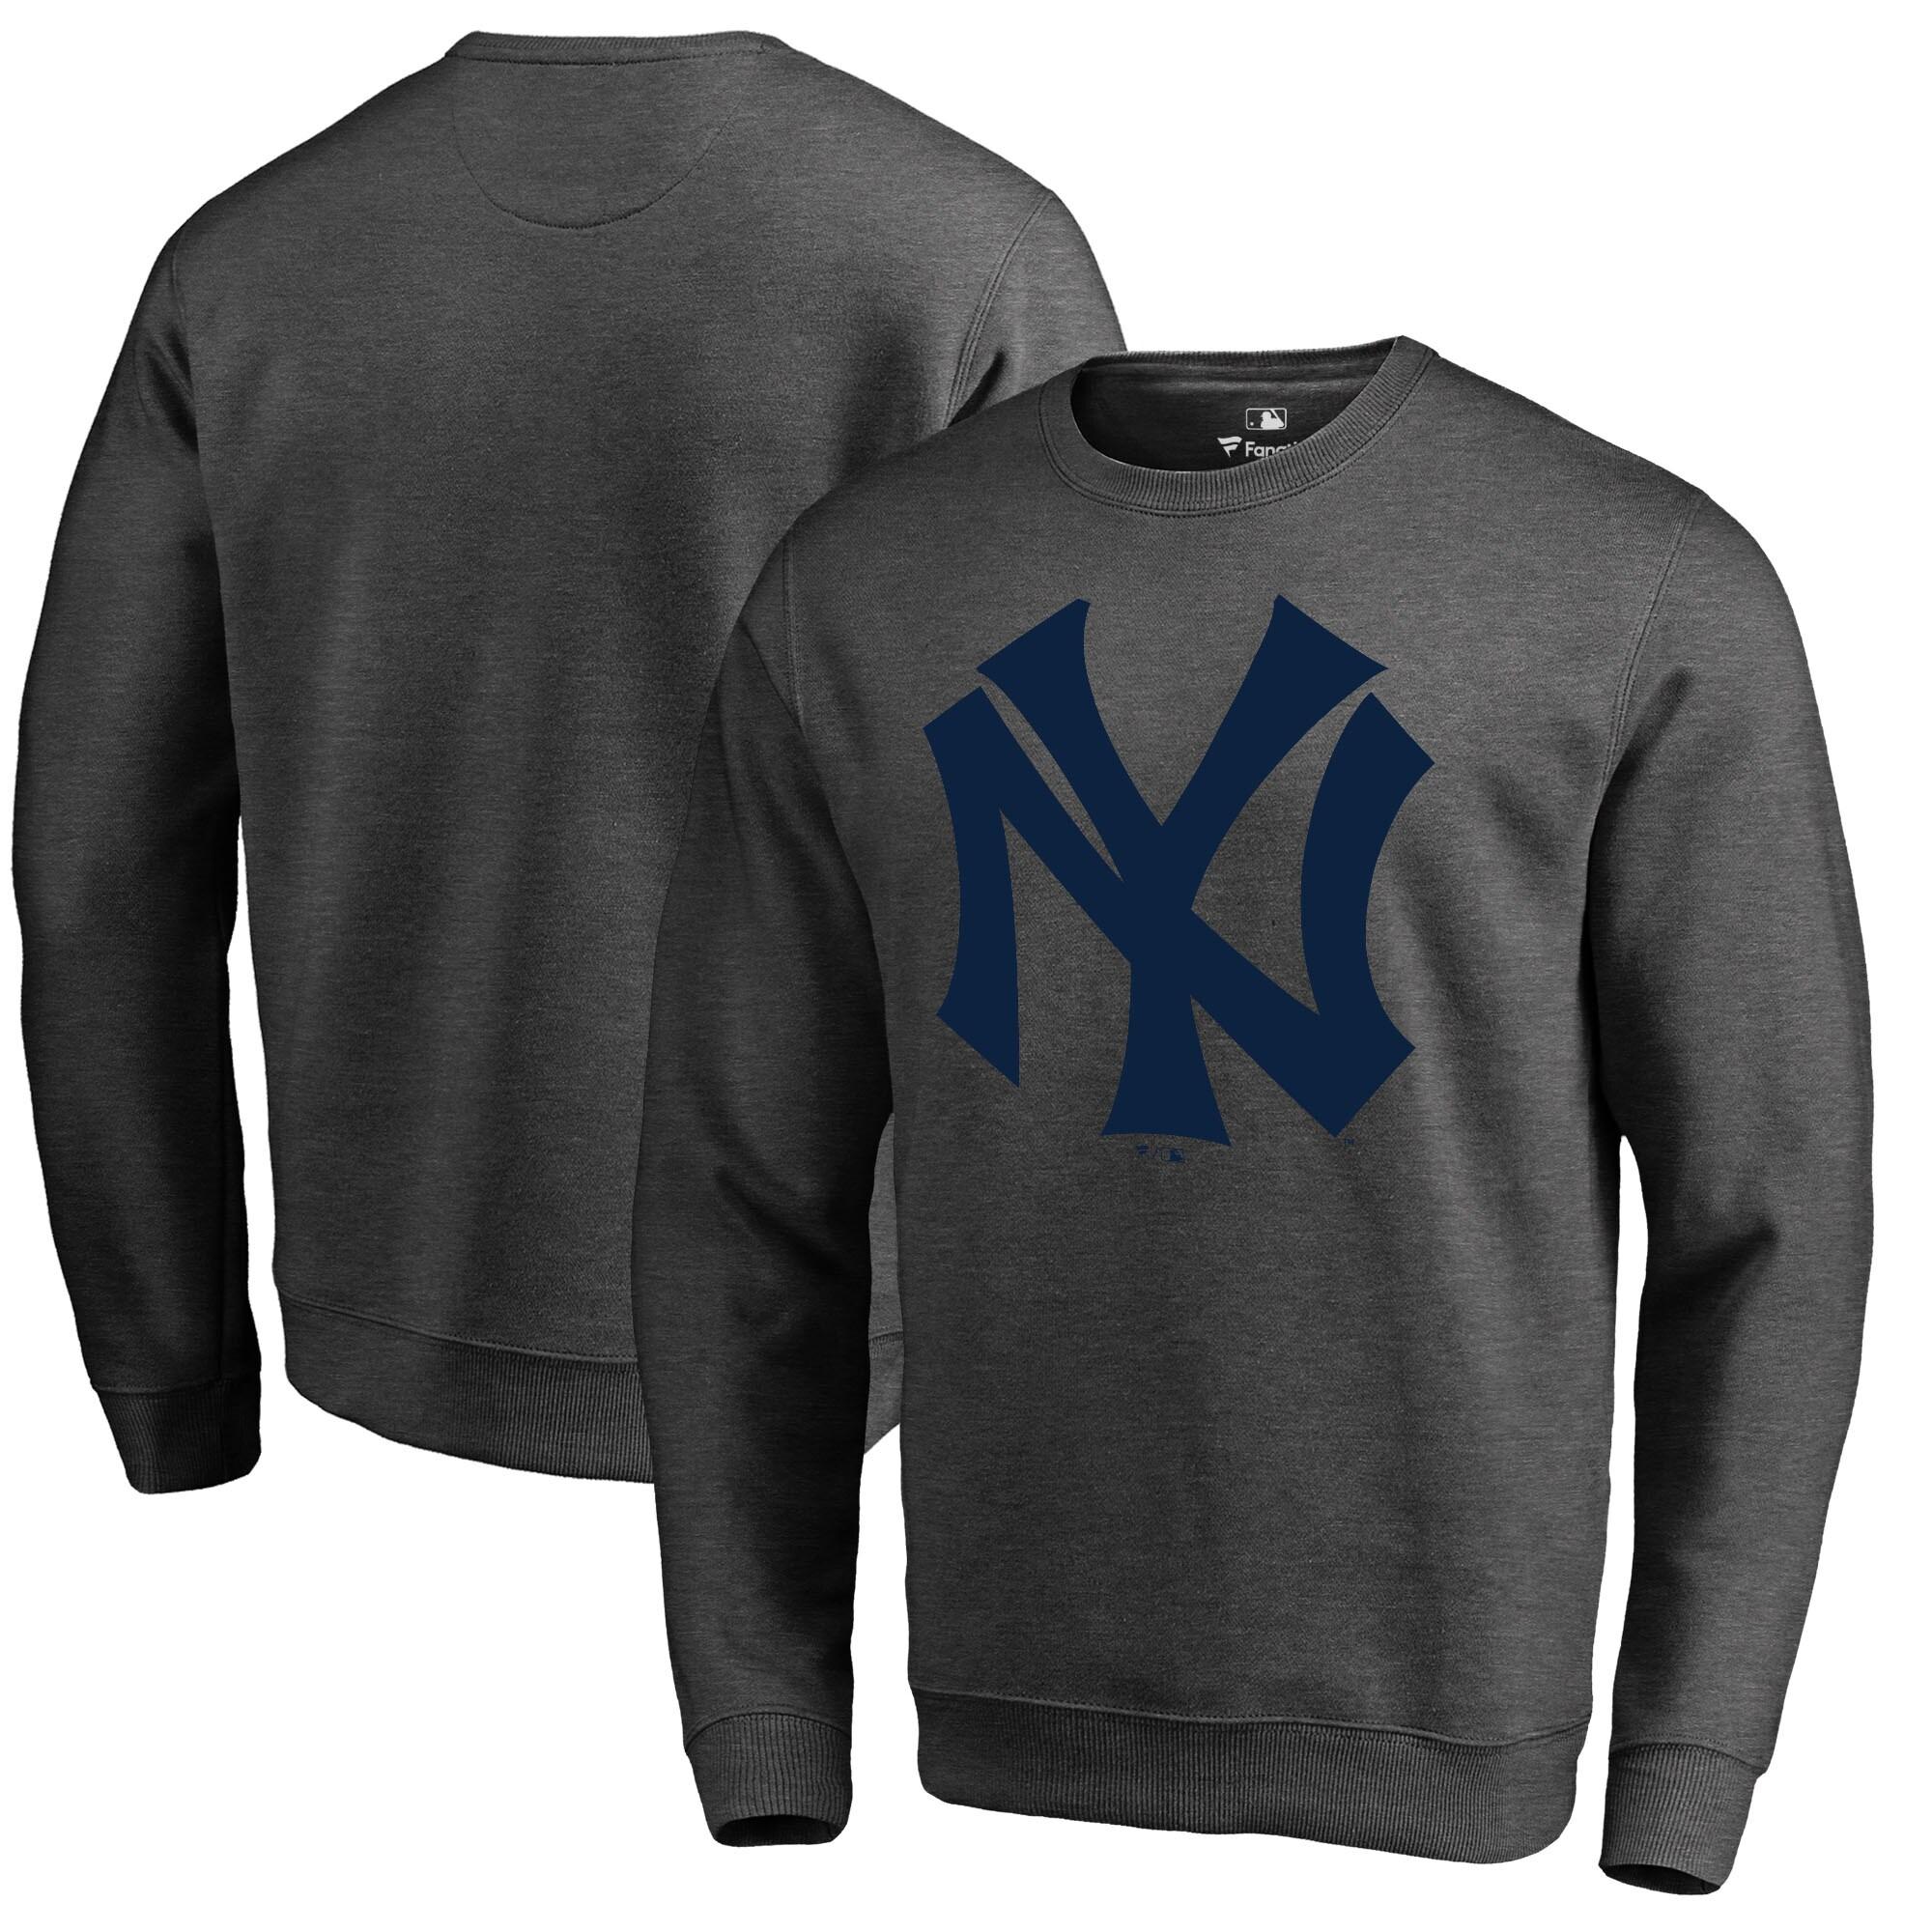 New York Yankees Fanatics Branded Cooperstown Collection Huntington Sweatshirt - Heathered Gray